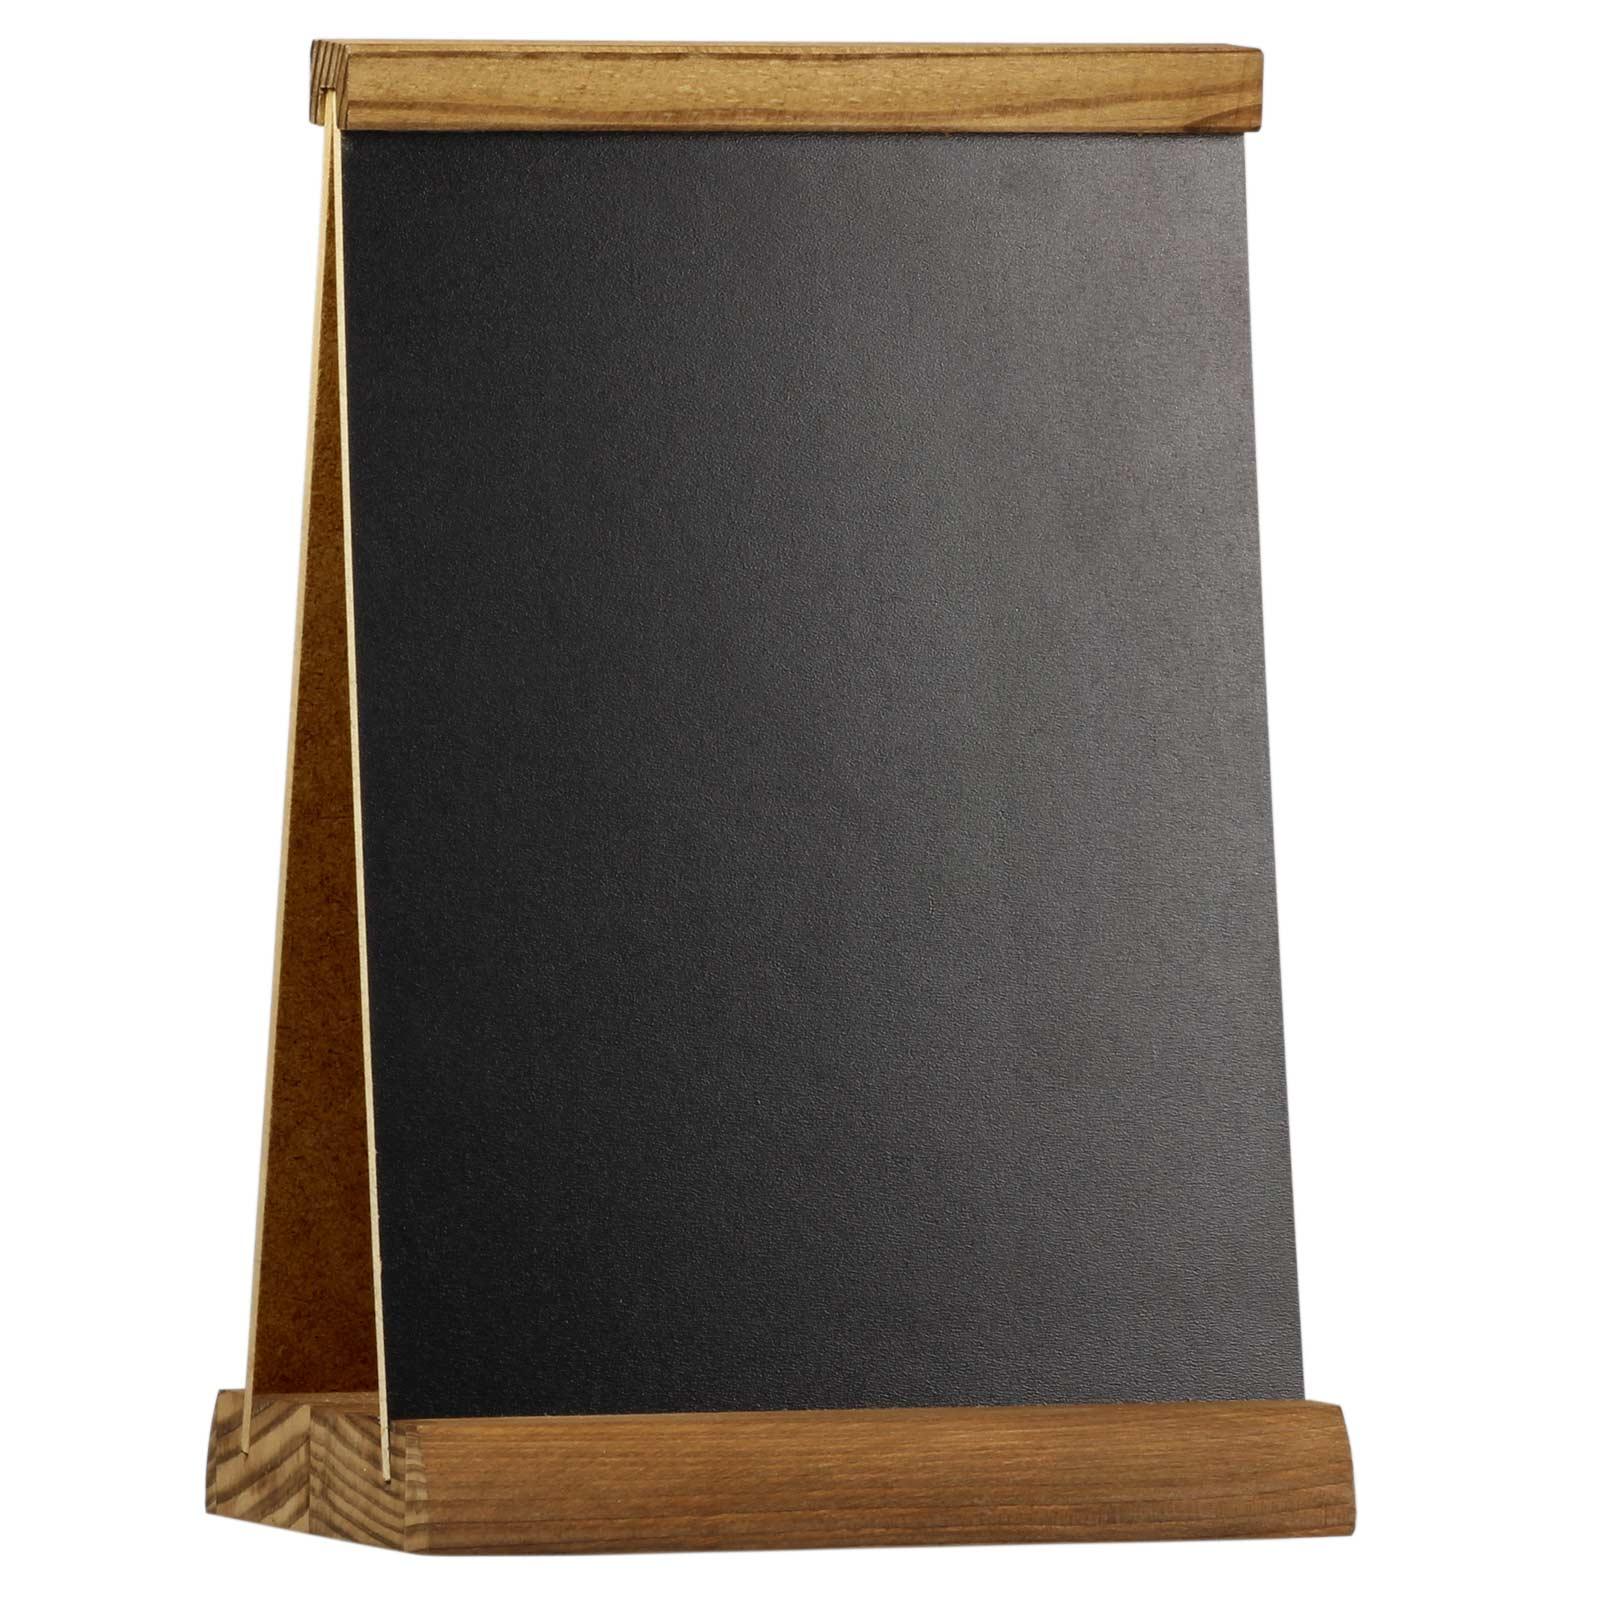 kreidetafel edinburgh a5 a4 beidseitig werbetafel holztafel tischaufsteller holz ebay. Black Bedroom Furniture Sets. Home Design Ideas